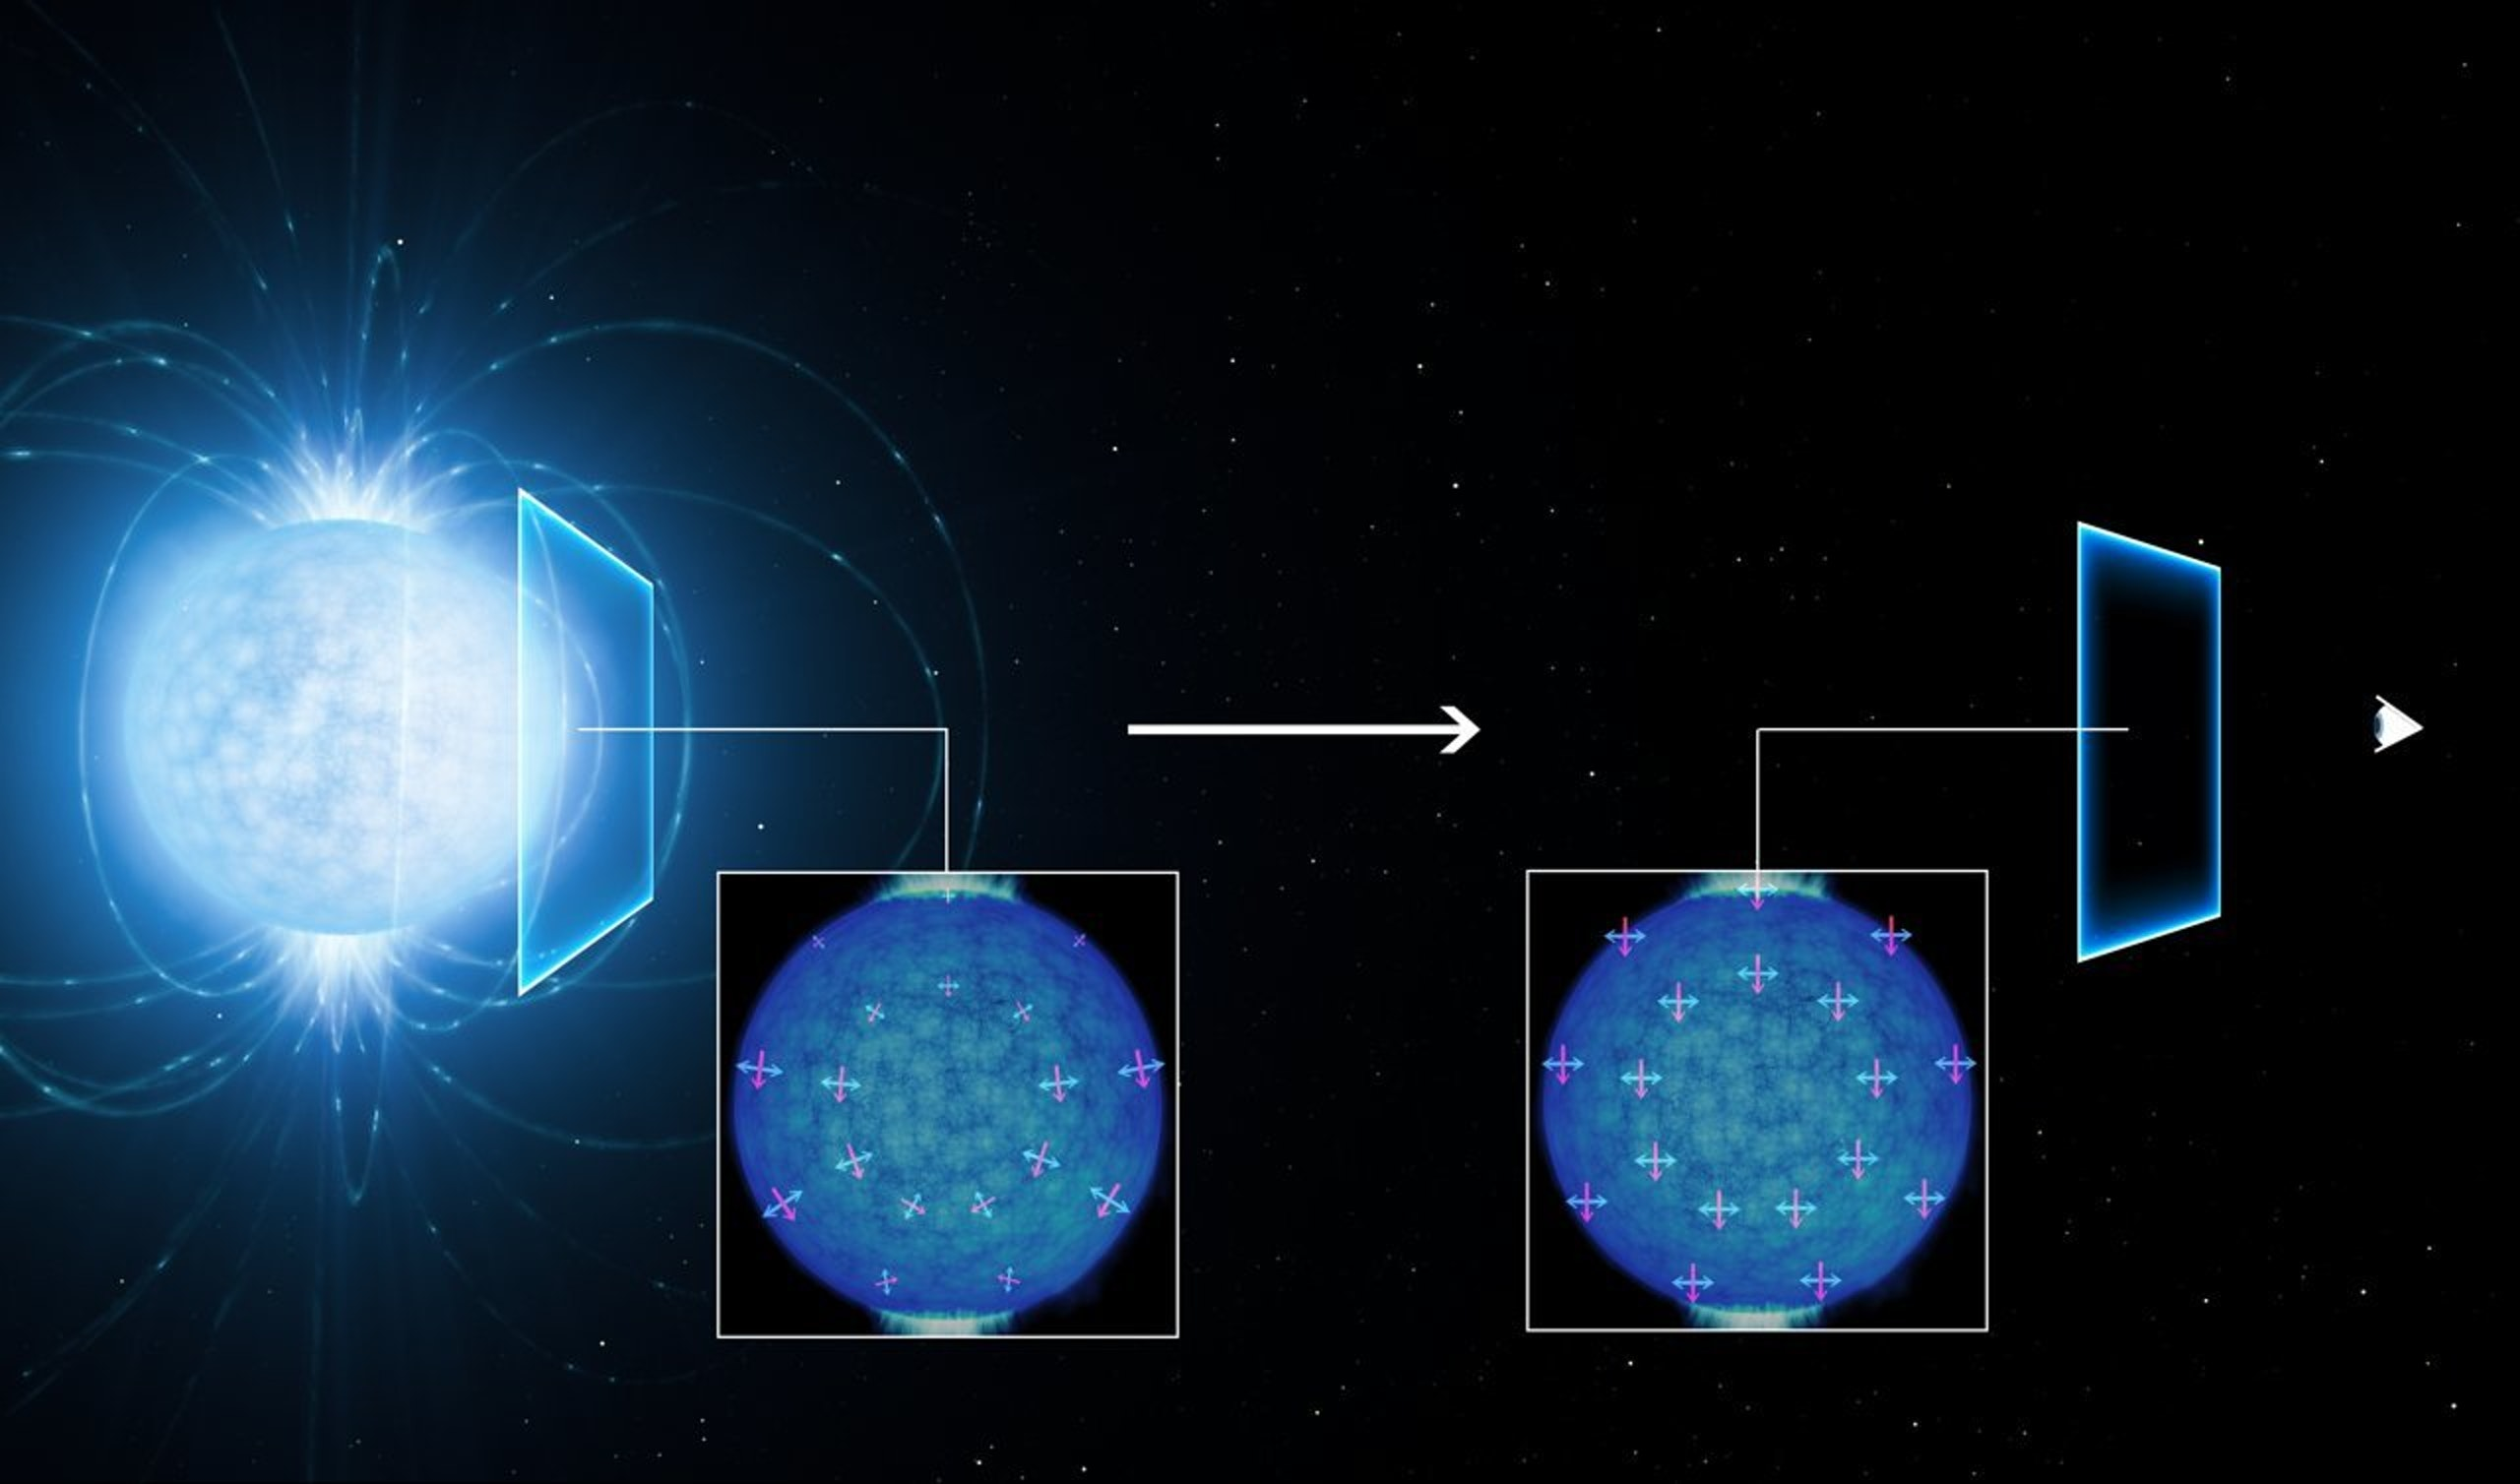 Up election 2017 behind sp congress alliance lies the open pursuit of a polarisating agenda firstpost - Light Polarisation Around A Neutron Star